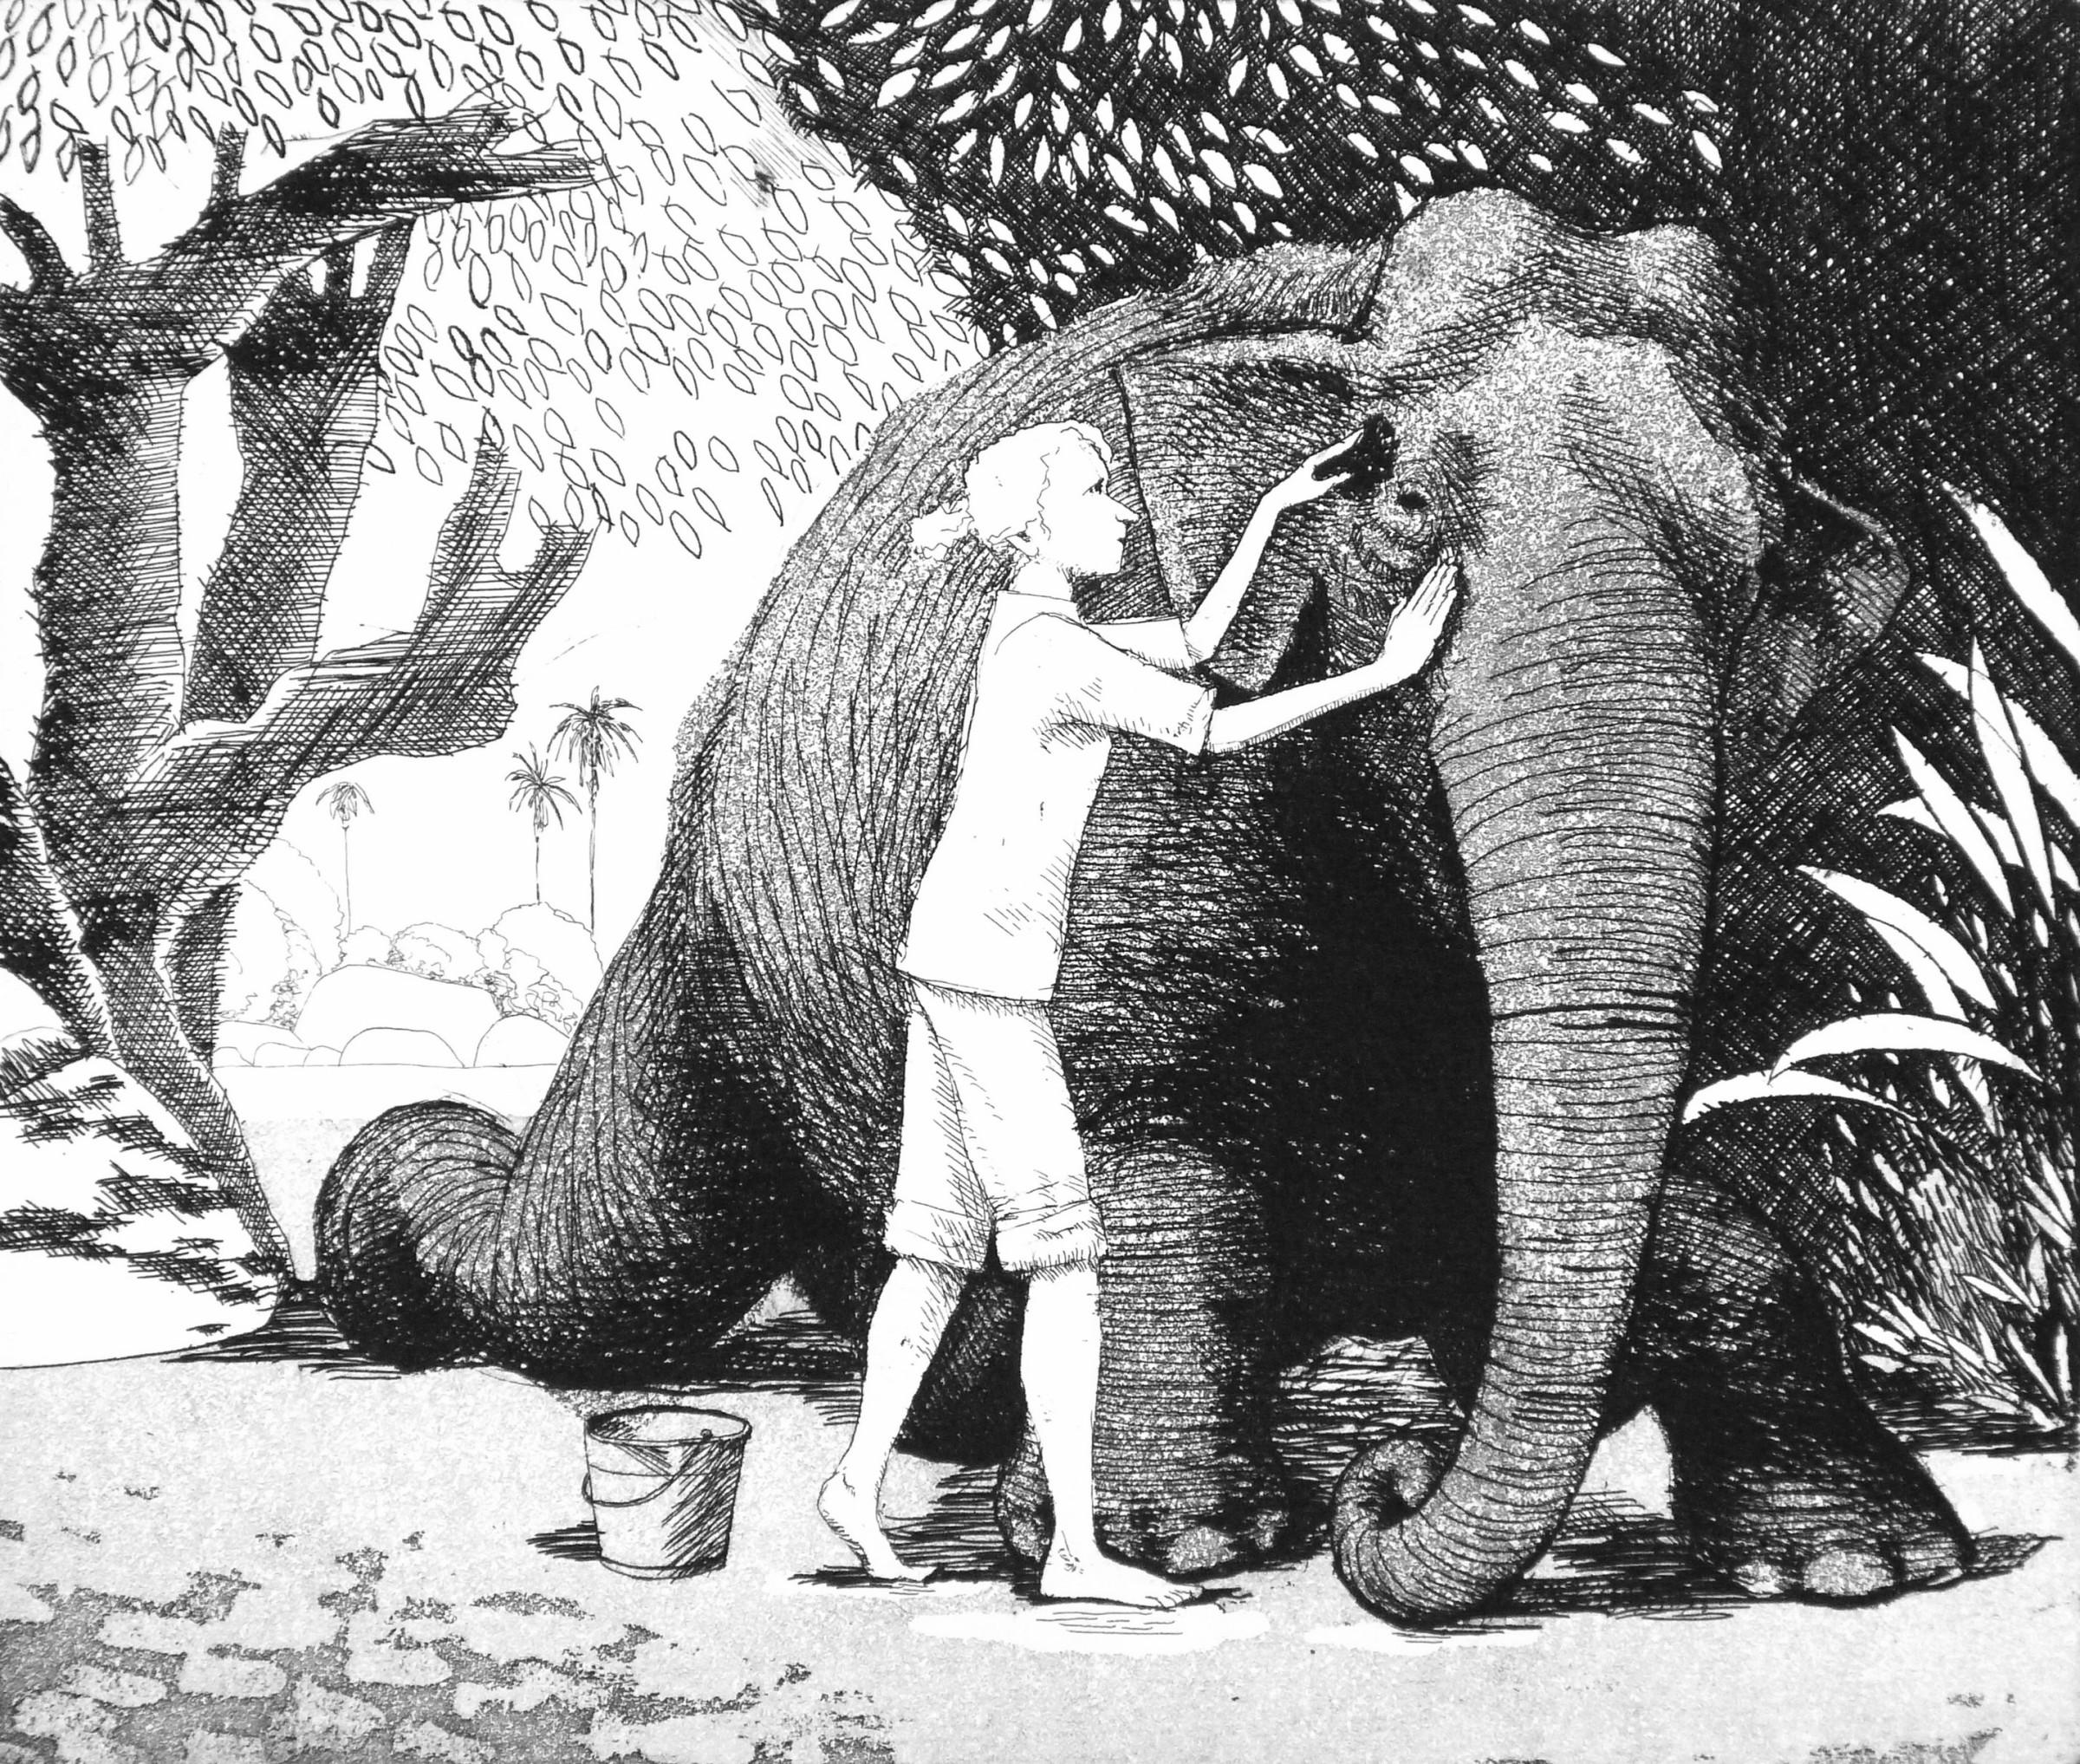 "<span class=""link fancybox-details-link""><a href=""/artists/129-frans-wesselman-re/works/9480/"">View Detail Page</a></span><div class=""artist""><span class=""artist""><strong>Frans Wesselman RE</strong></span></div><div class=""title""><em>Washing an Elephant</em></div><div class=""medium"">etching</div>"